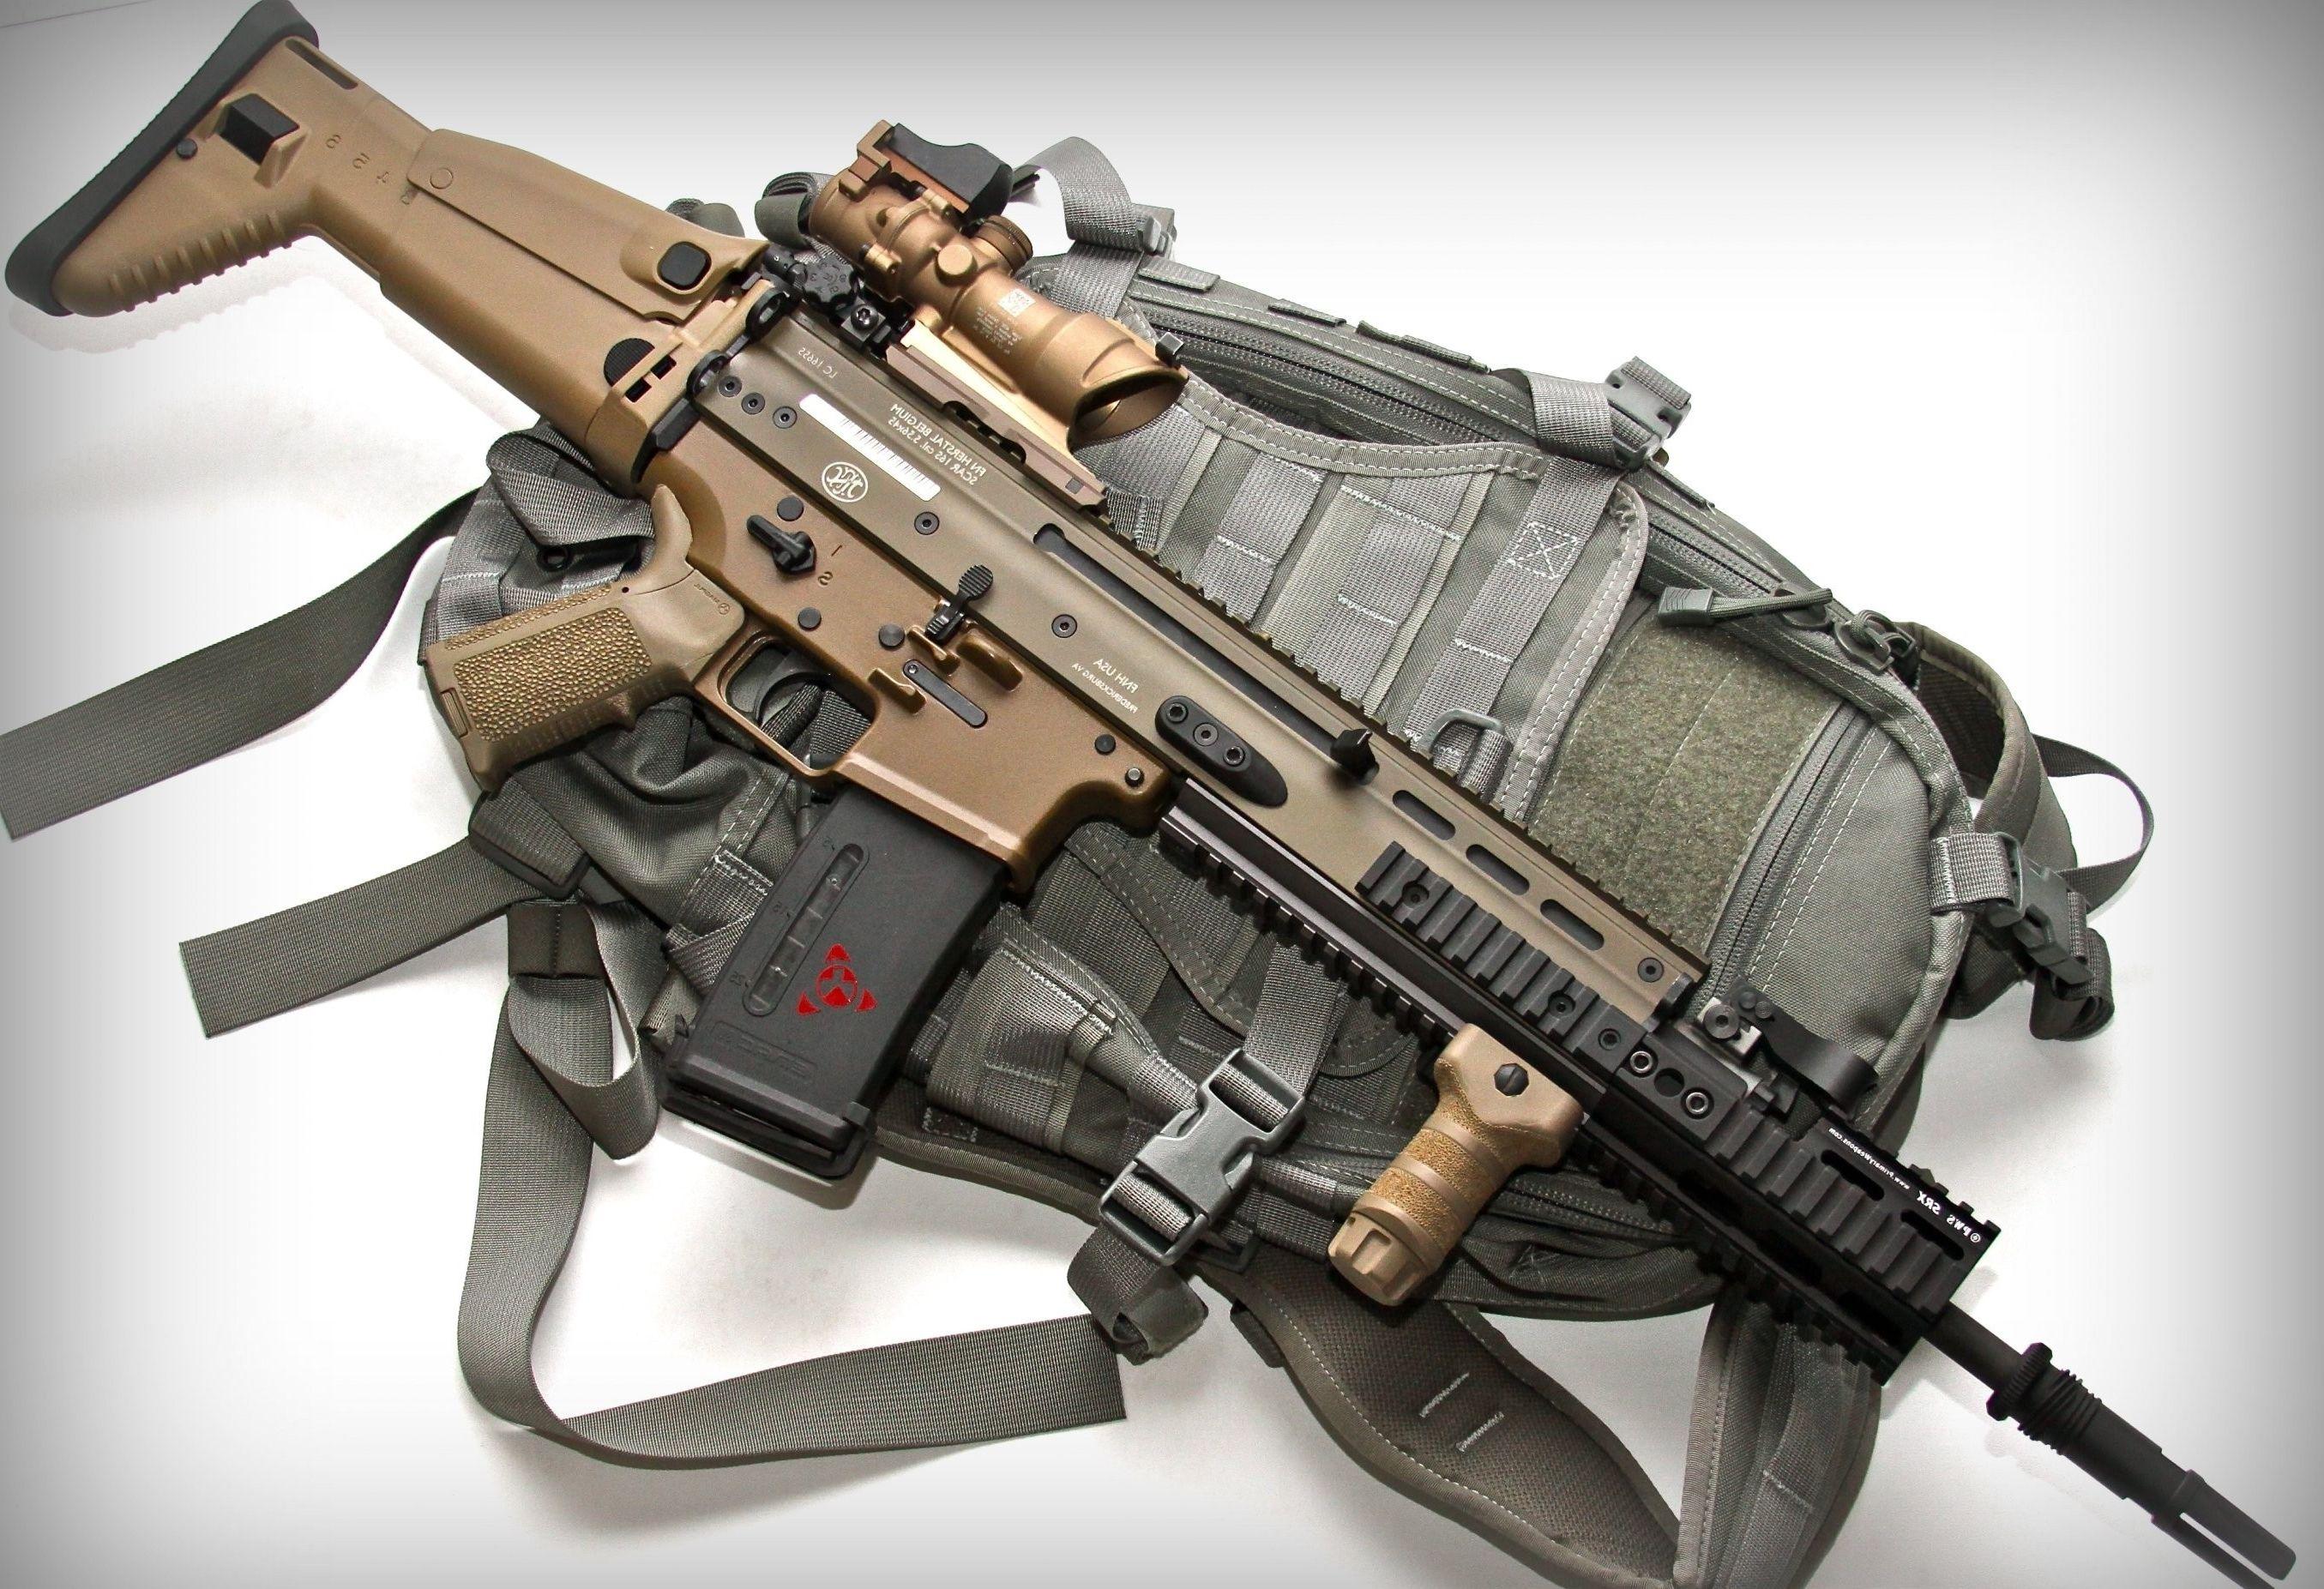 Professional Military Machine Gun Wallpapers Hd Cool Ass Guns And